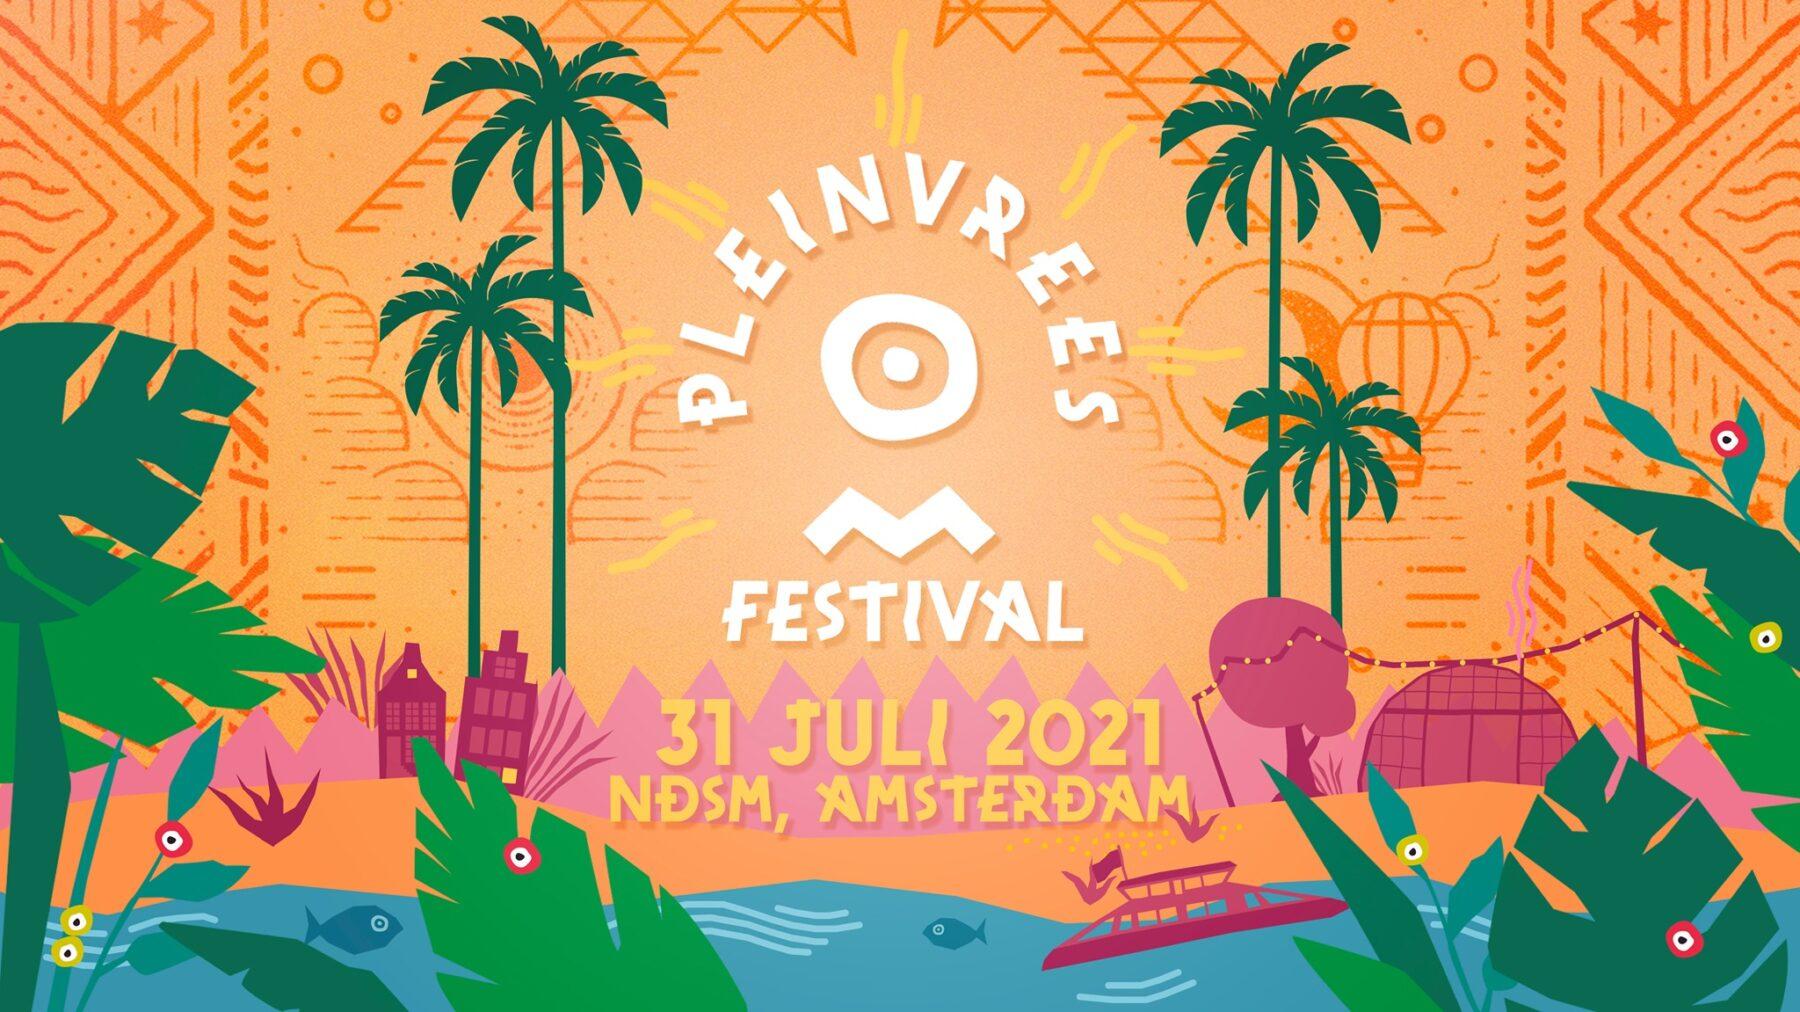 Pleinvrees Festival